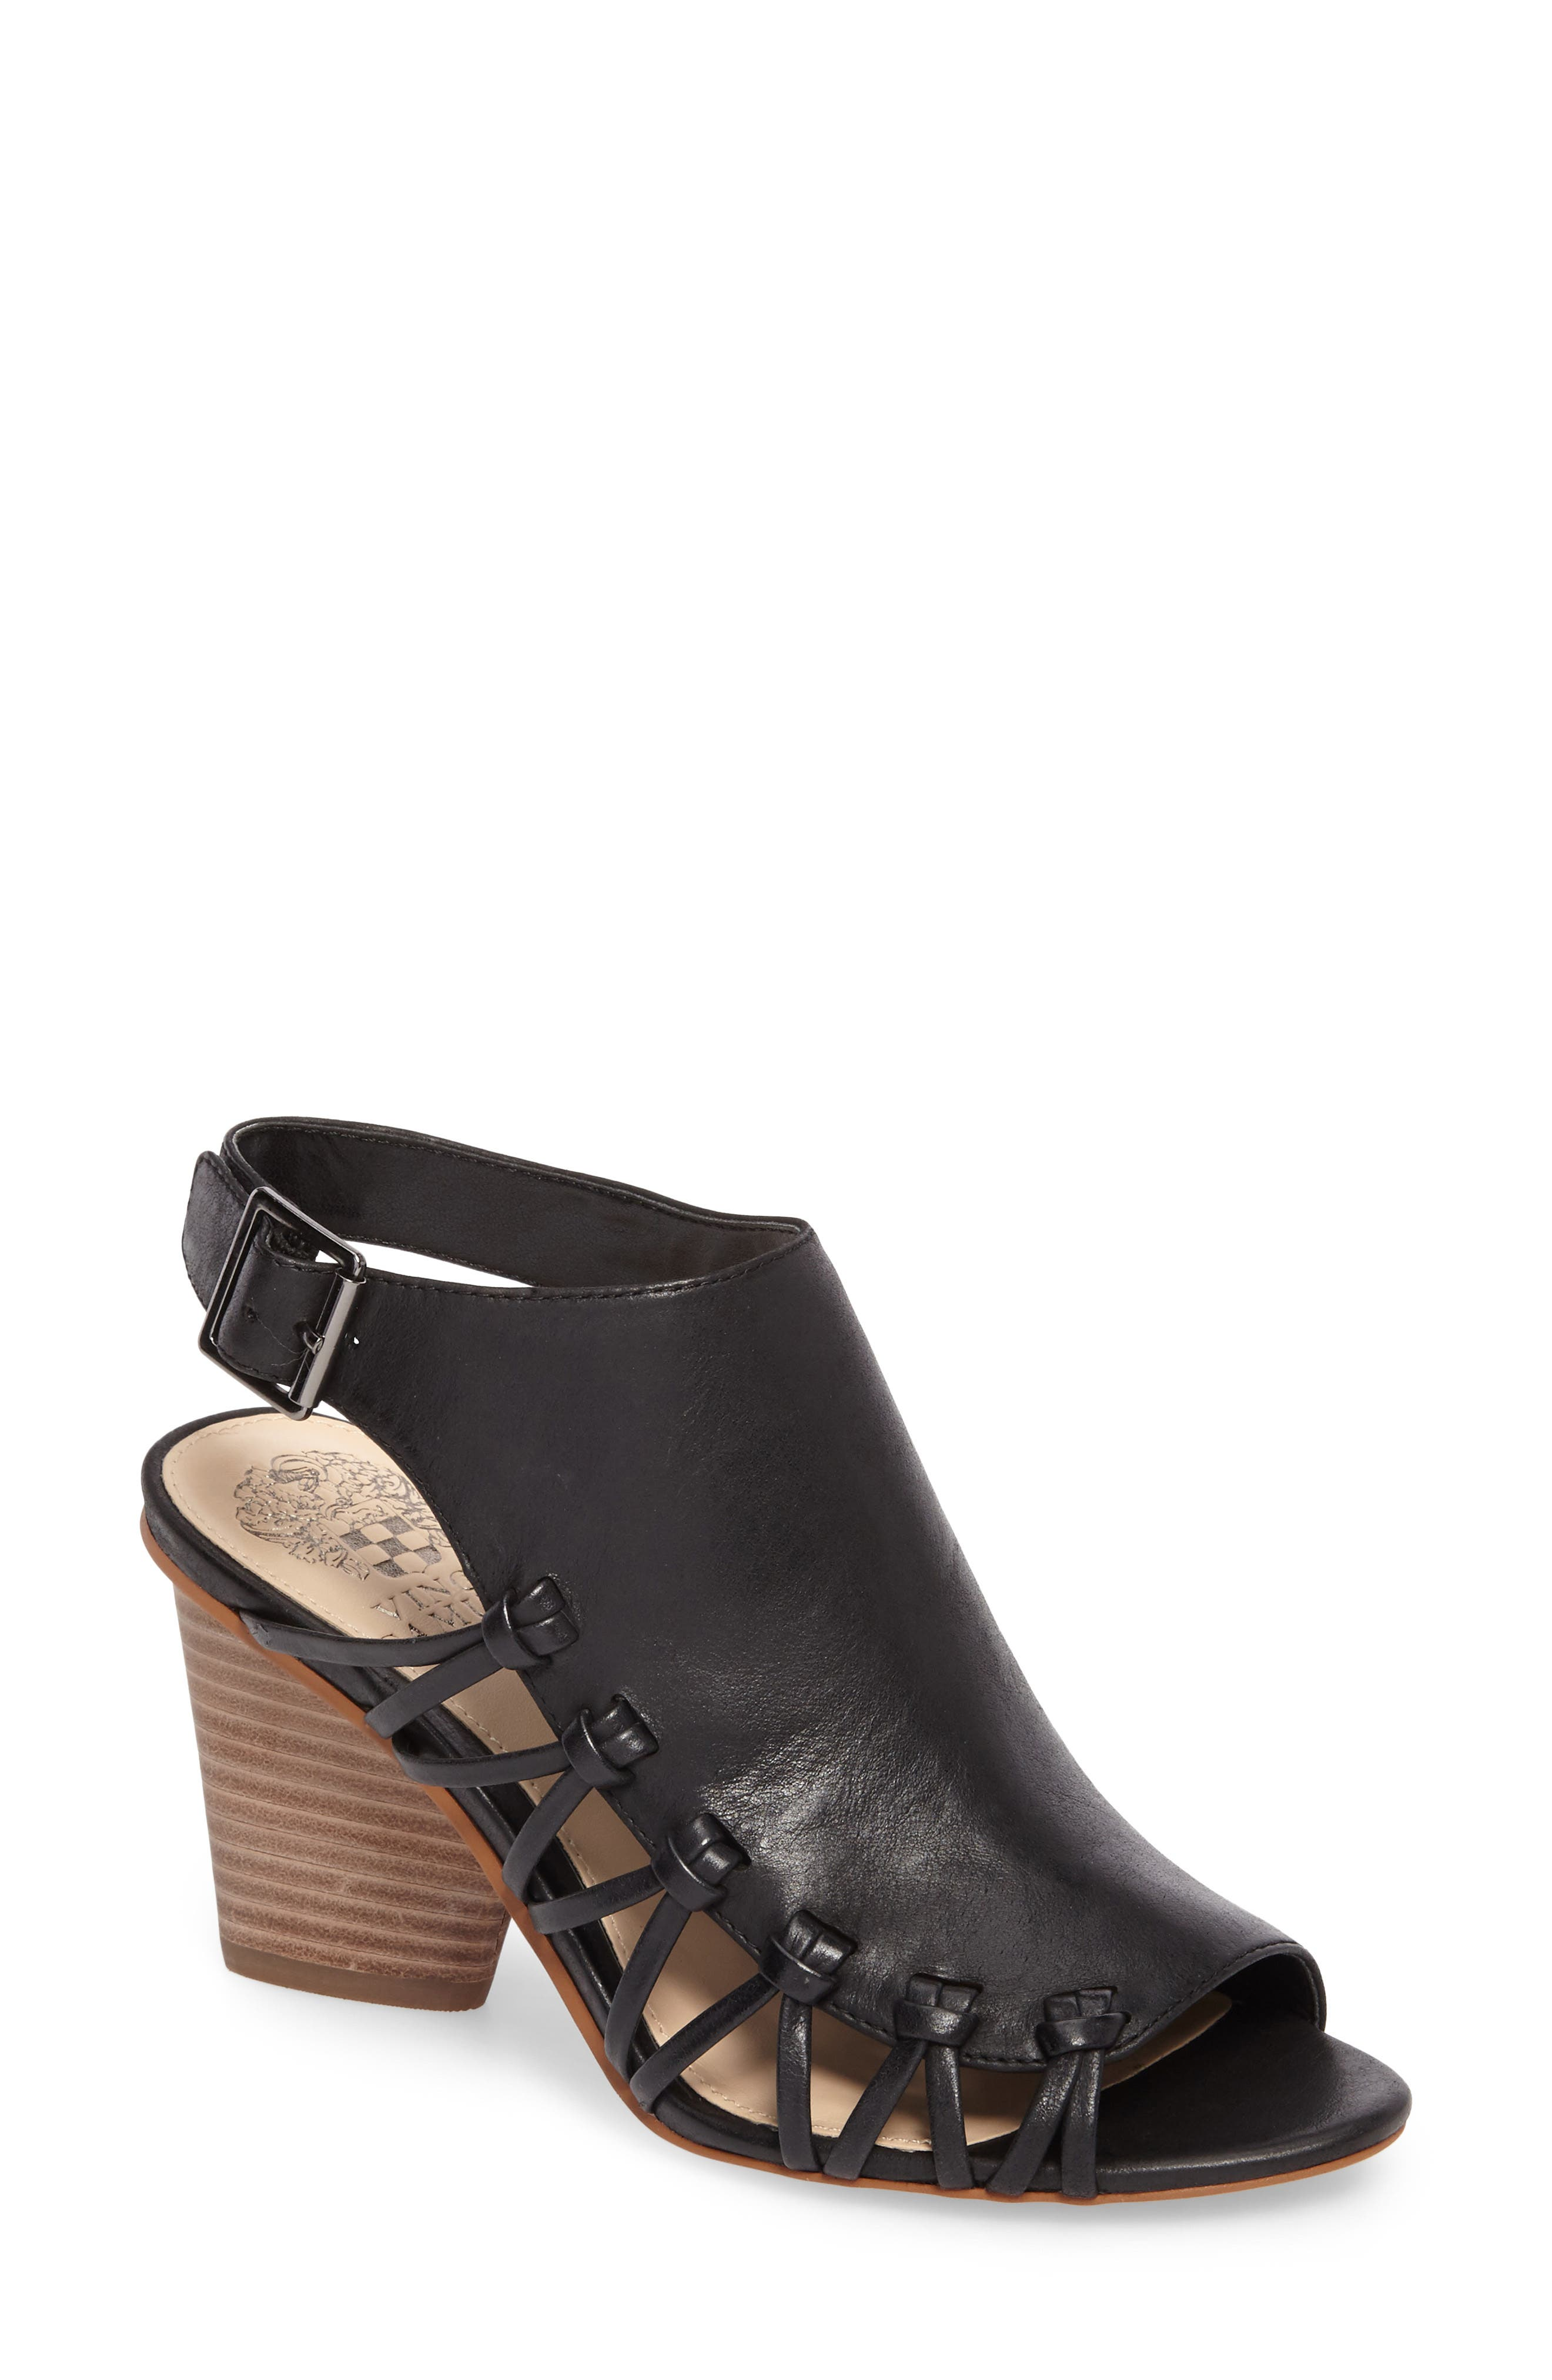 Ankara Sandal,                         Main,                         color, Black Leather